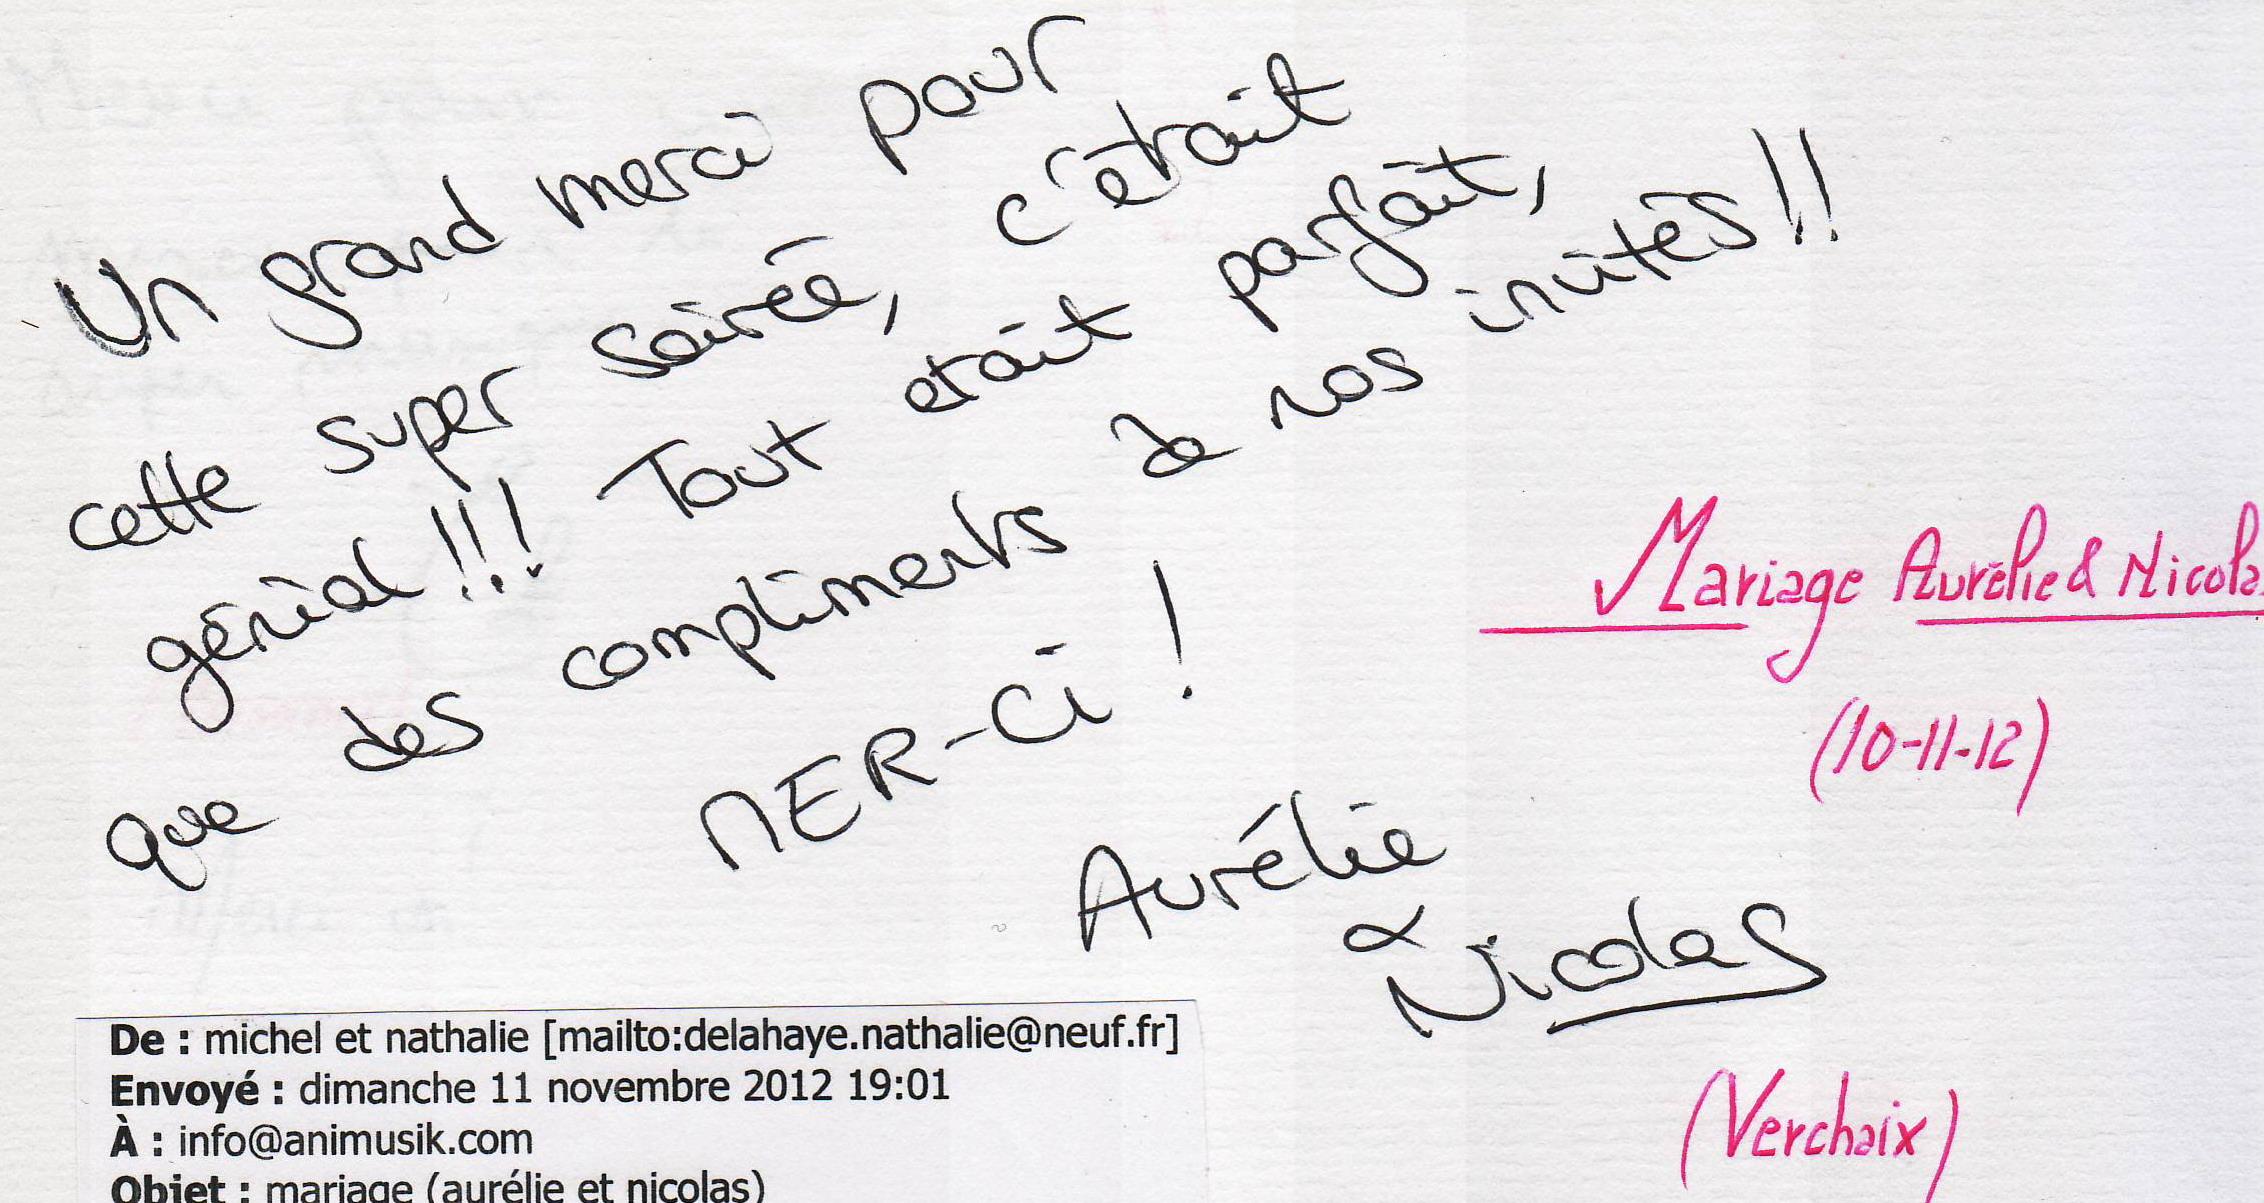 Mariage_KOWALSKI_Nicolas_&_Aurélie_(Verchaix)_(10-11-2012)